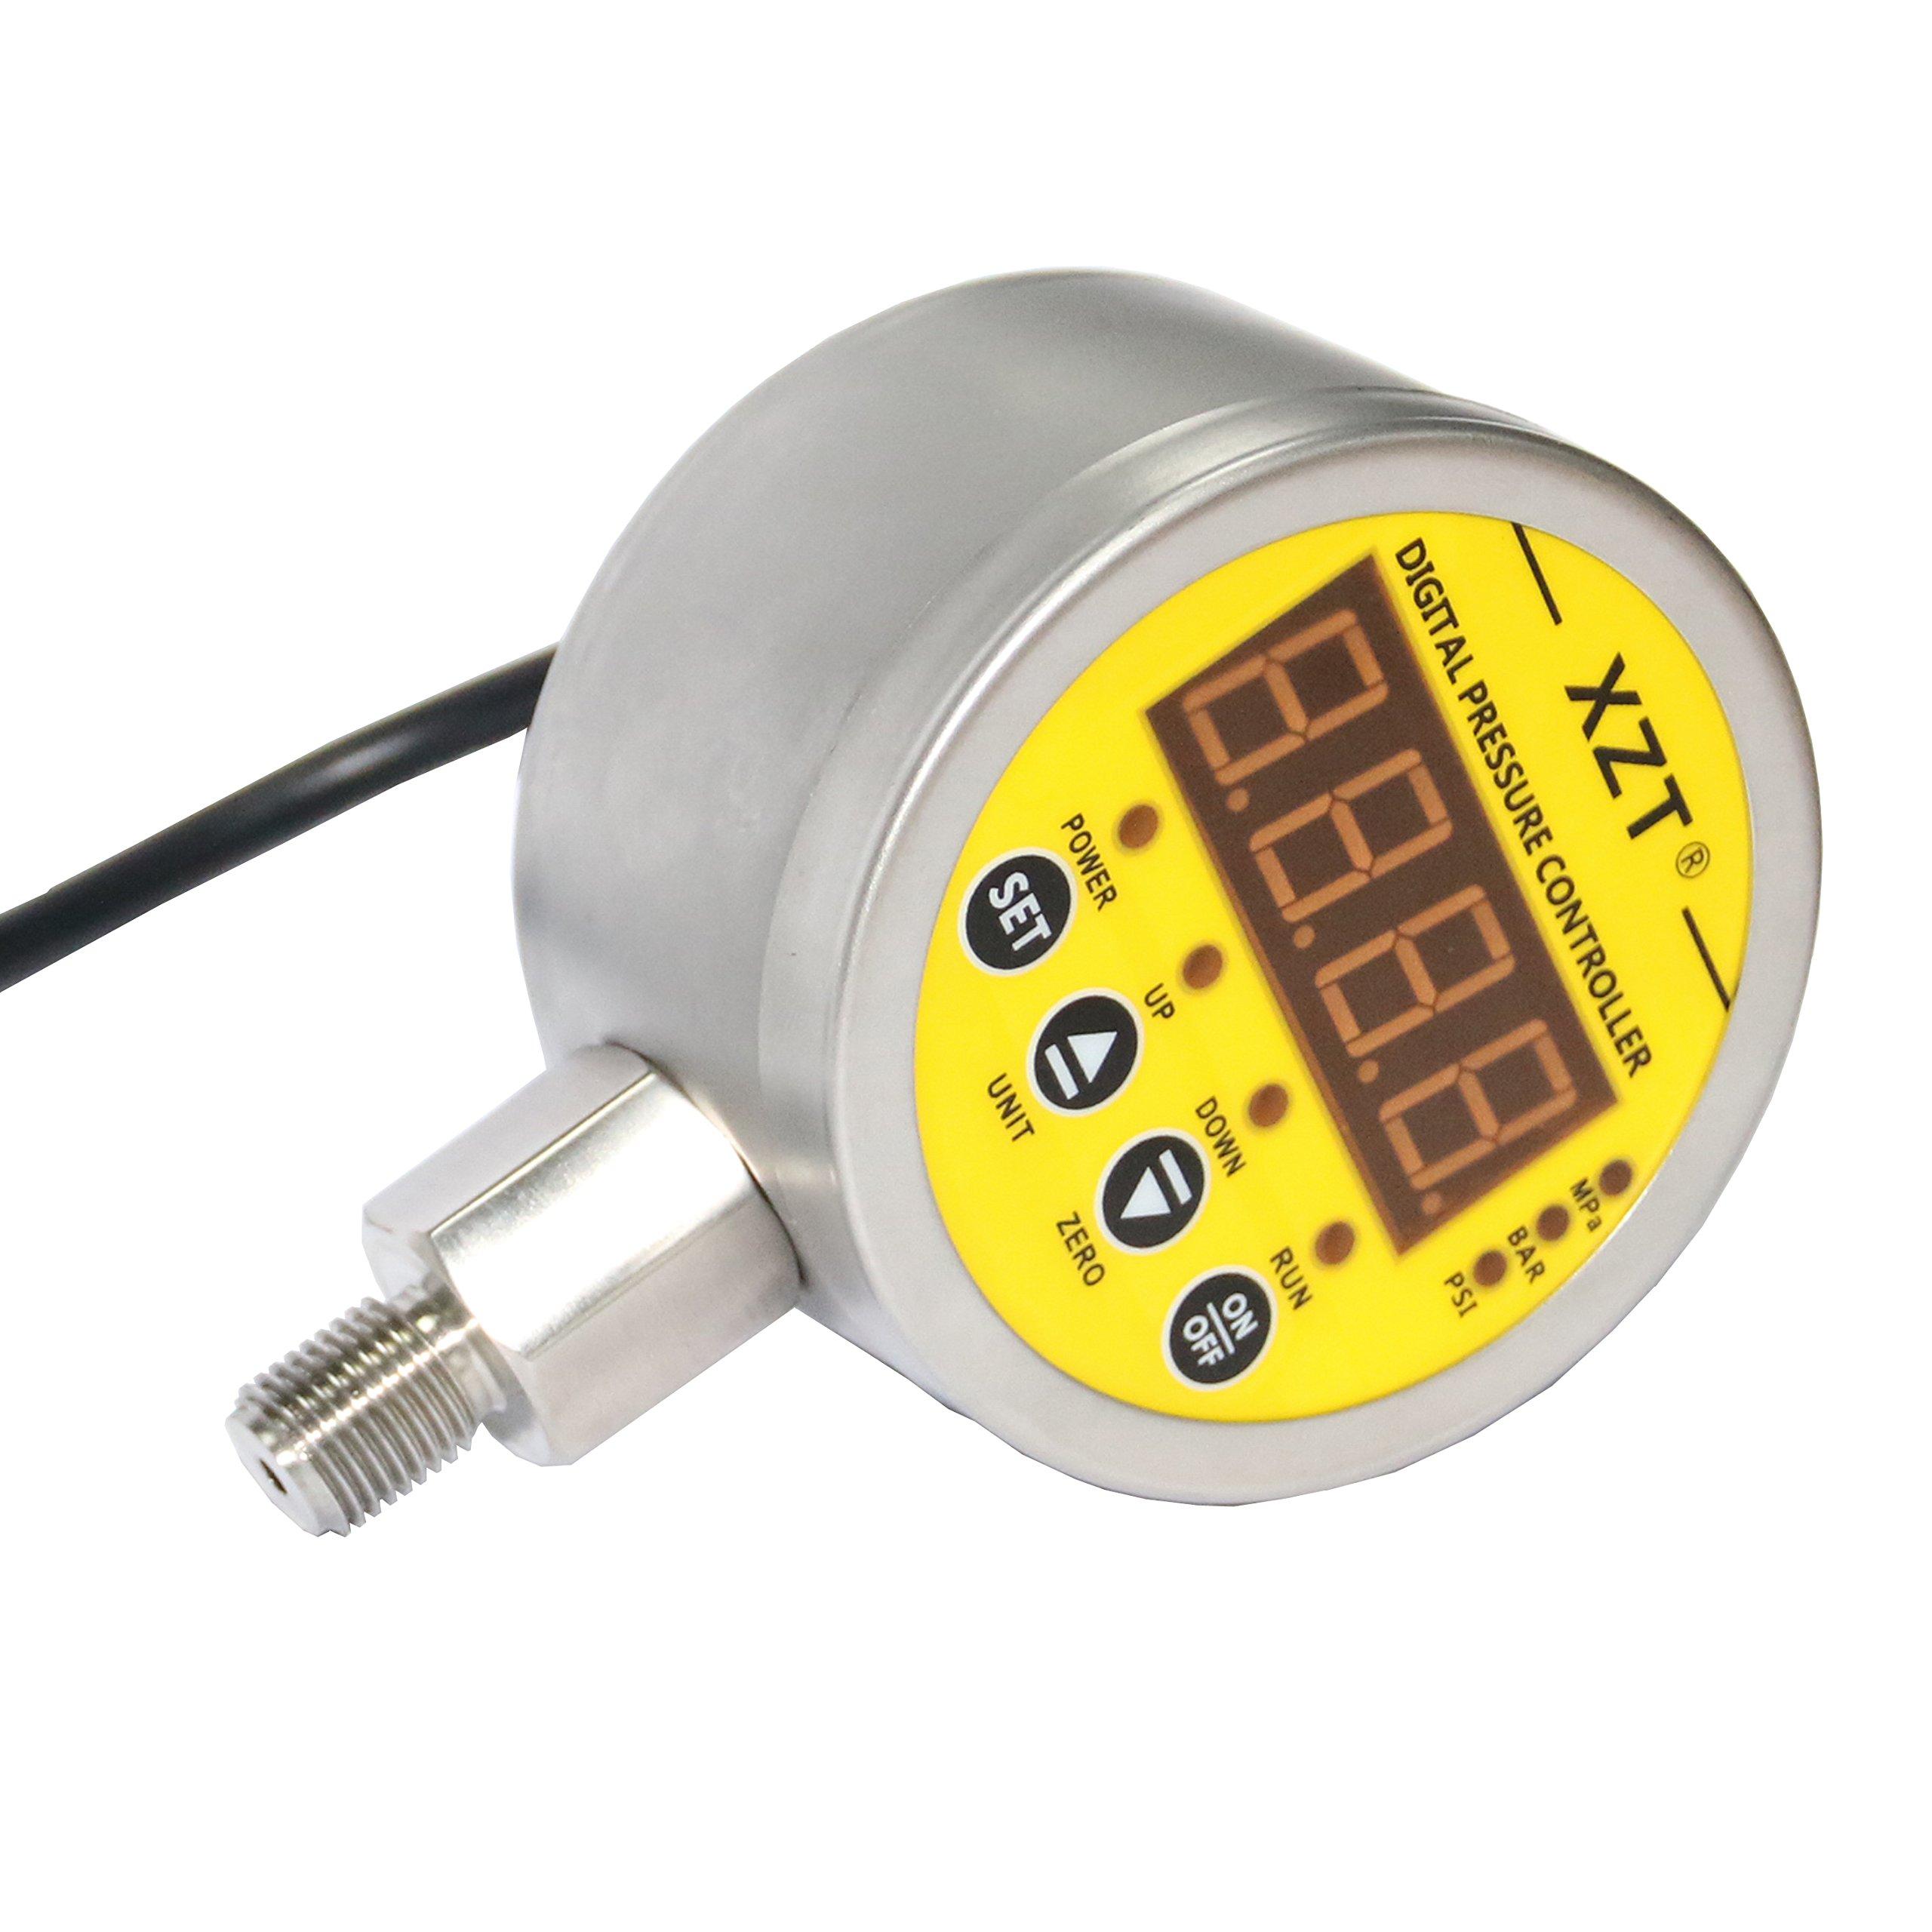 XZT 230PSI-NPT Digital Pressure Switch controller for Water Pump Air Compressor 110VAC-B